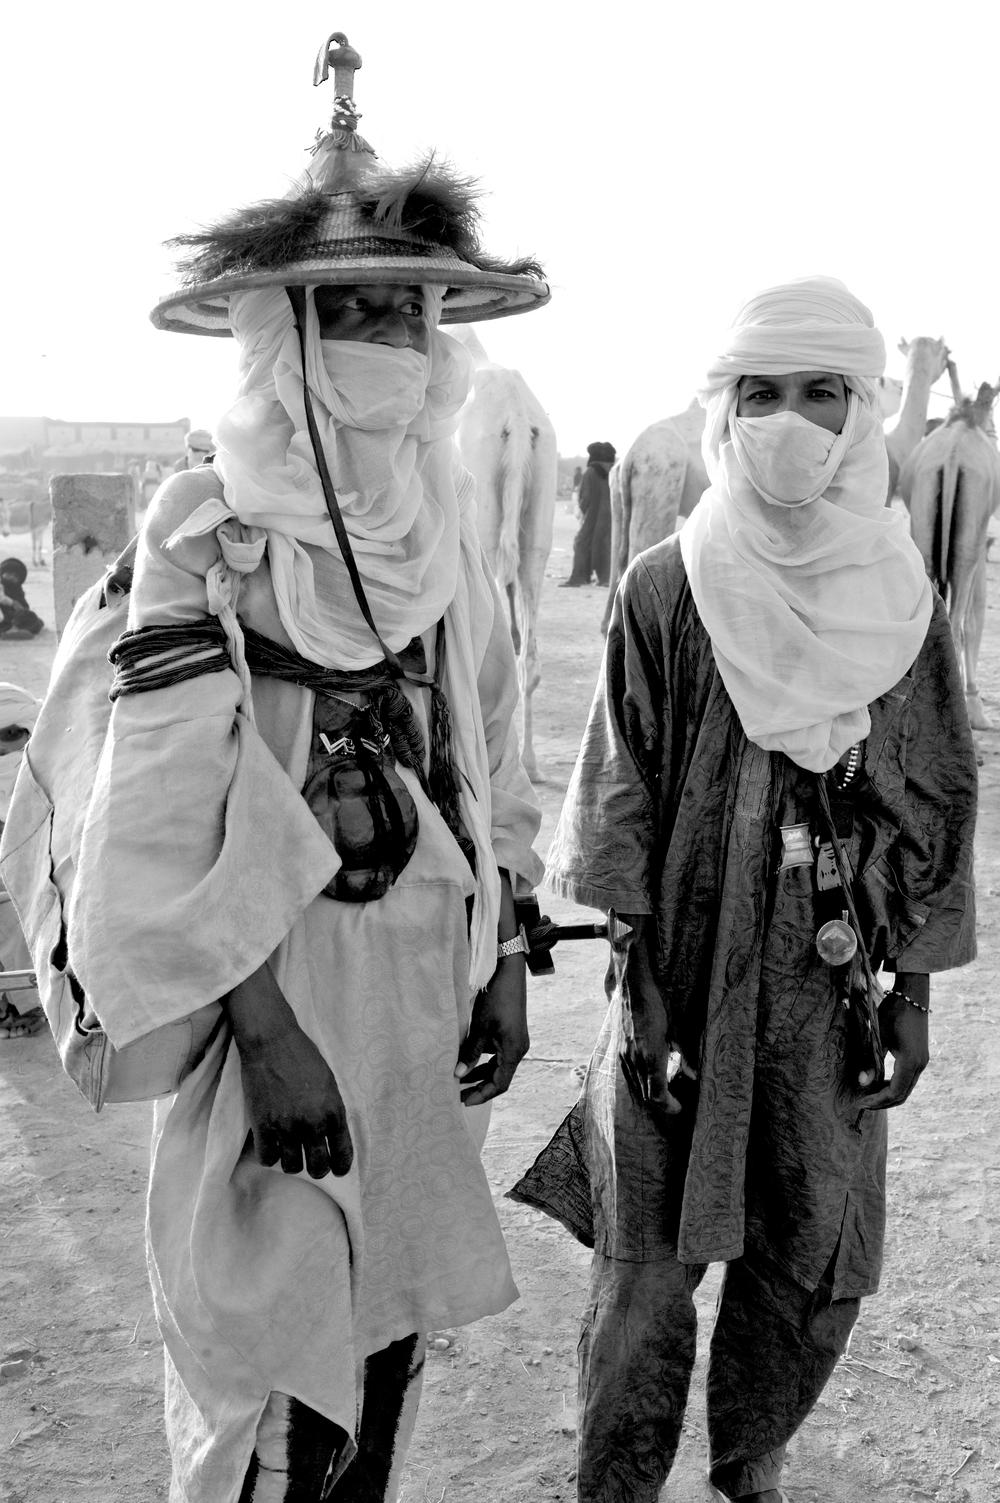 Tuareg, Agadez, Niger